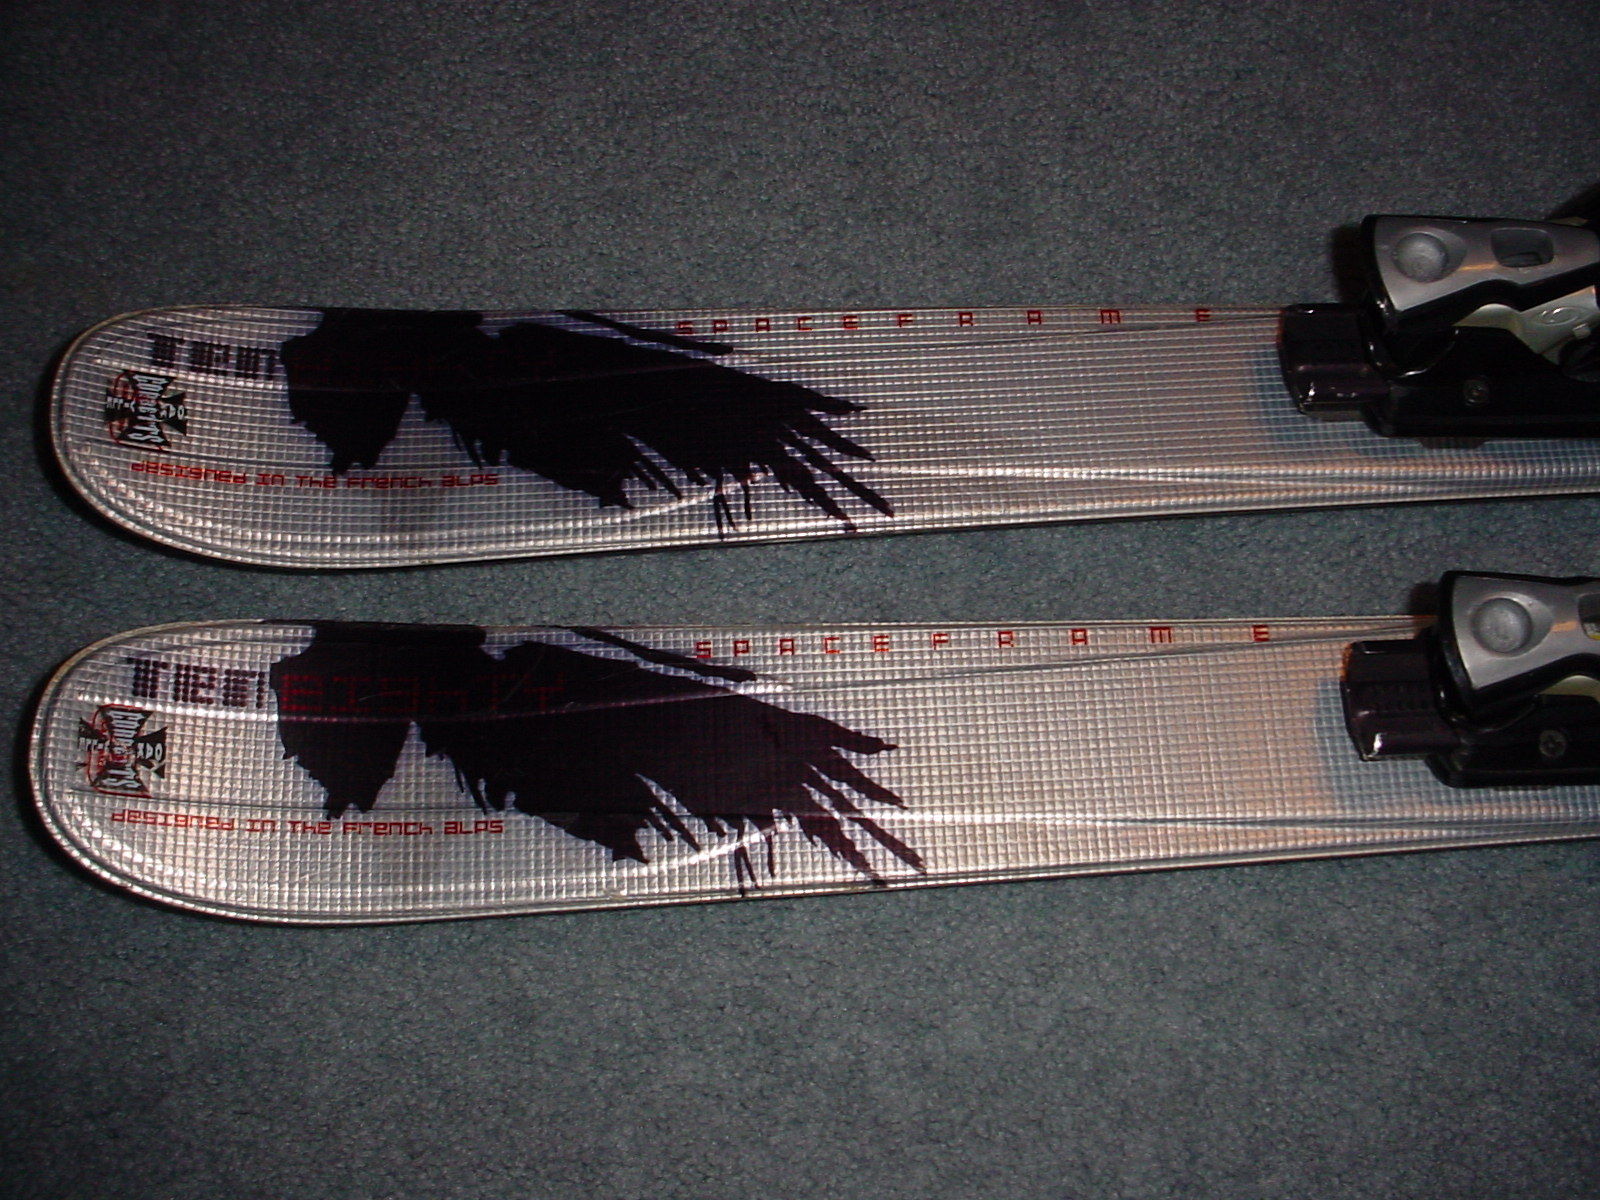 2005 Salomon 1080 tails